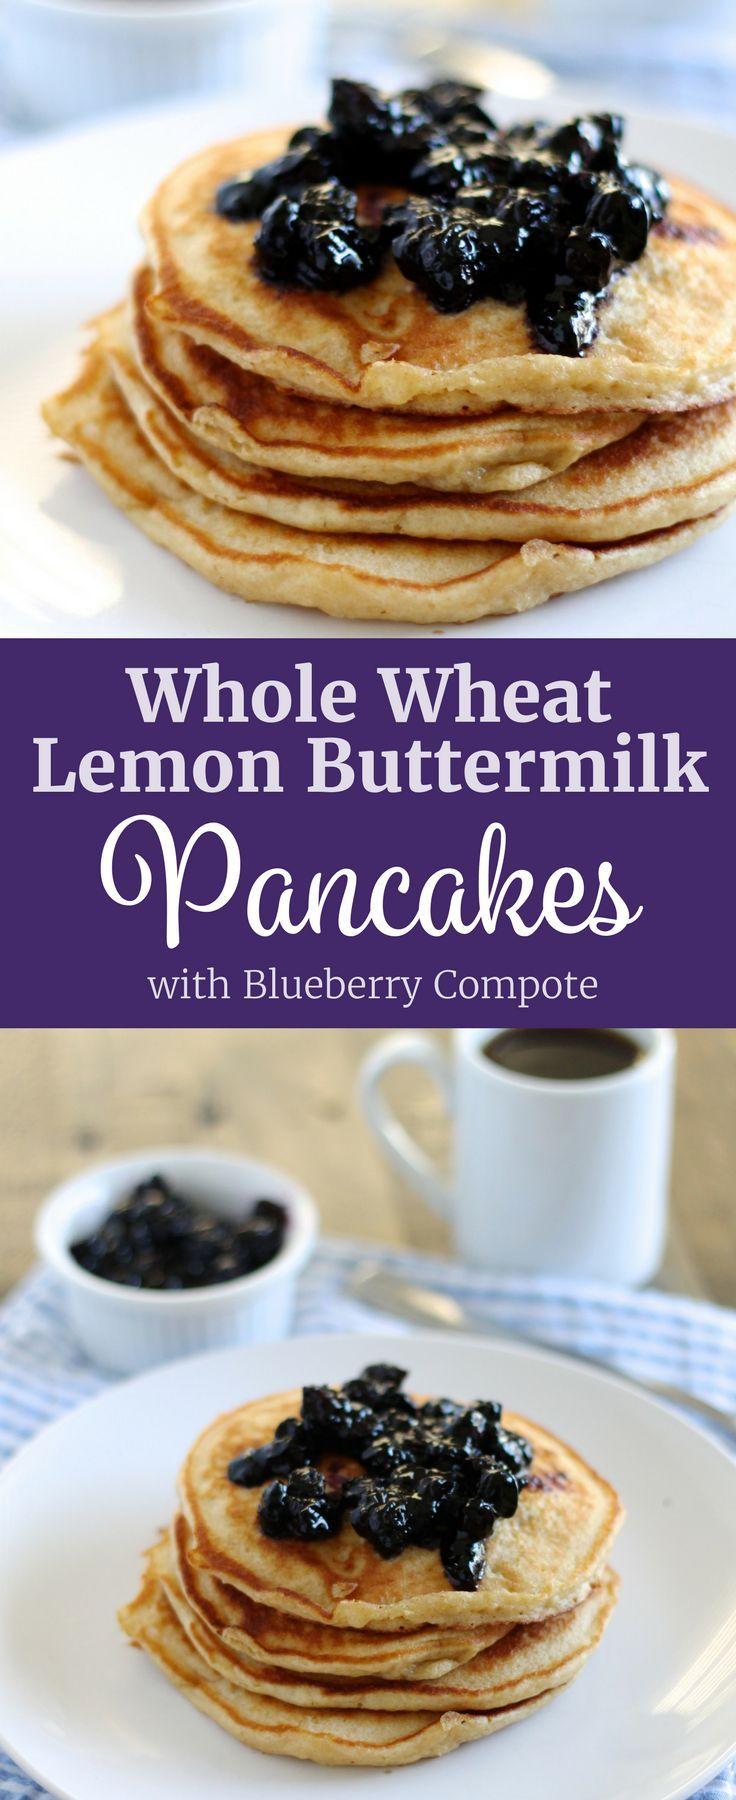 Whole Wheat Lemon Buttermilk Pancakes With Blueberry Compote Recipe Blueberry Compote Blueberry Compote Recipe Compote Recipe